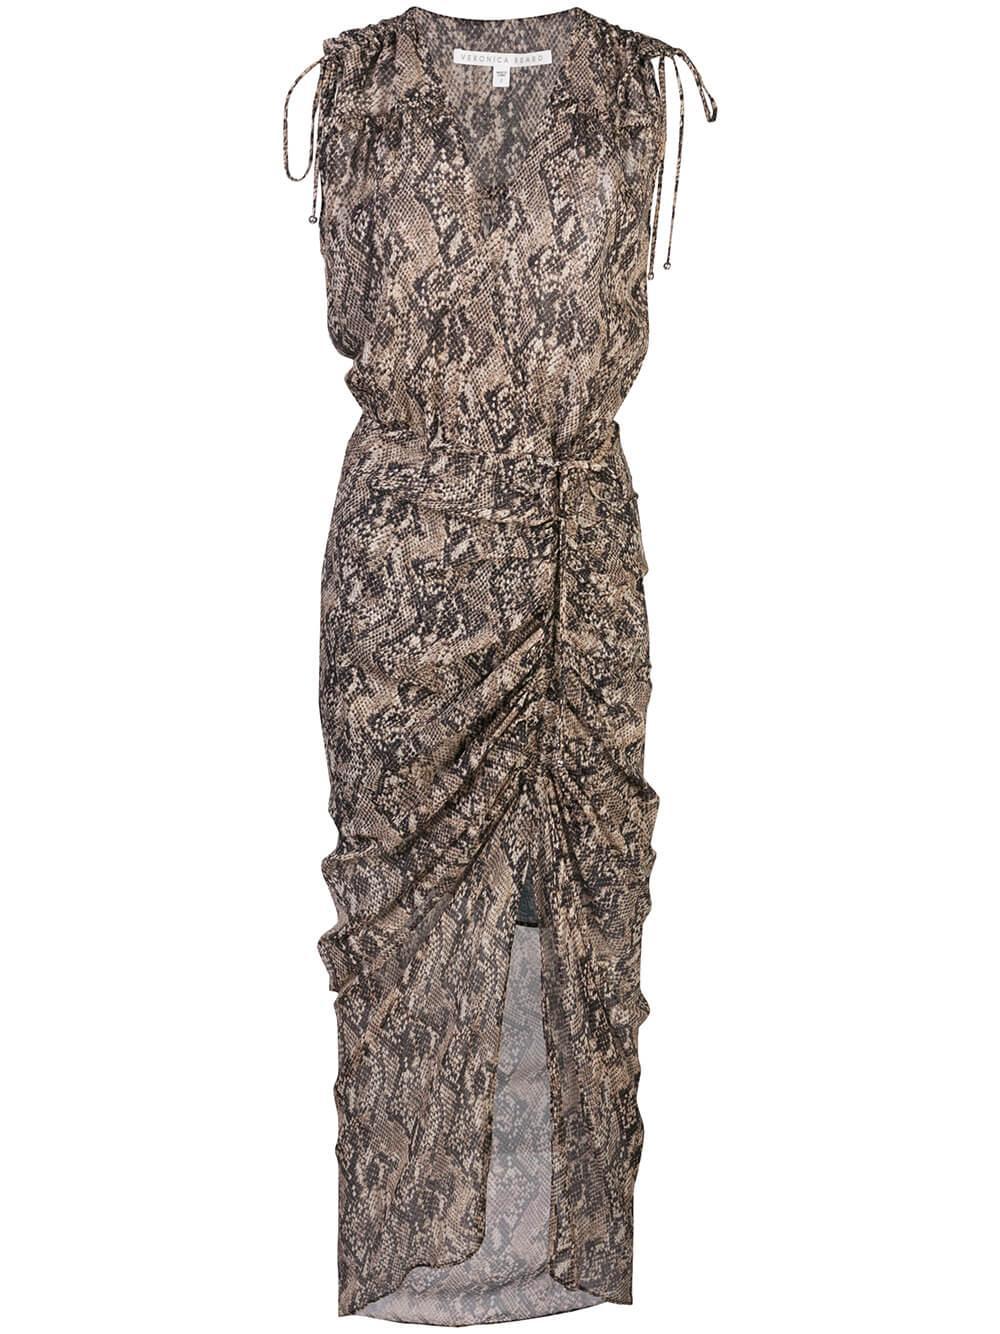 Teagan Sleeveless Python Print Midi Dress Item # 2001GGT012264